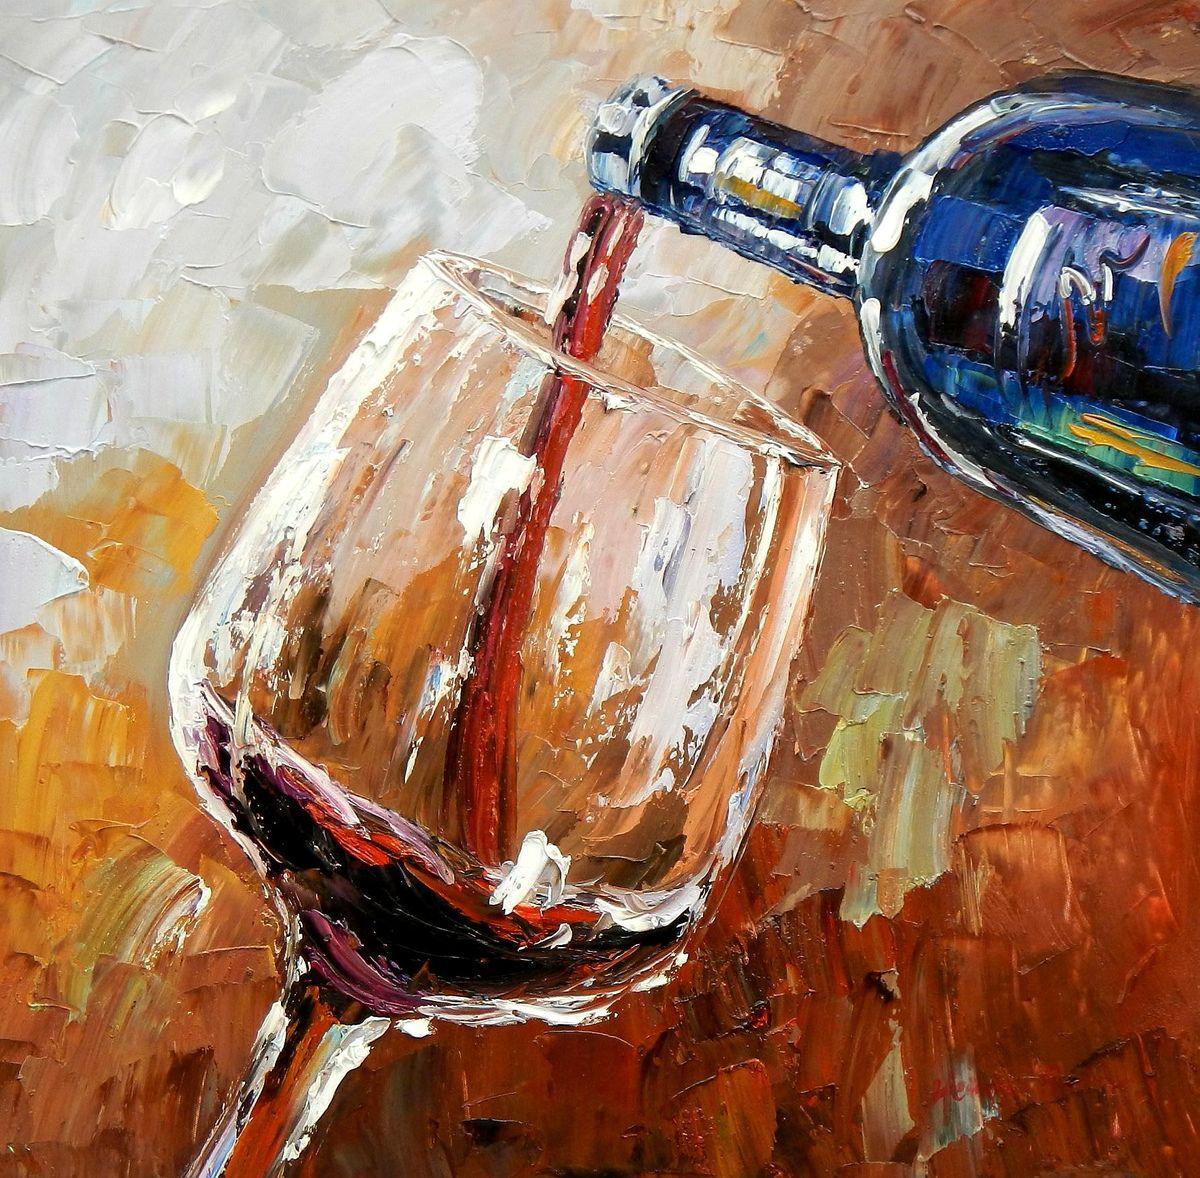 Modern Art - Winery Arts e95793 60x60cm Ölgemälde handgemalt